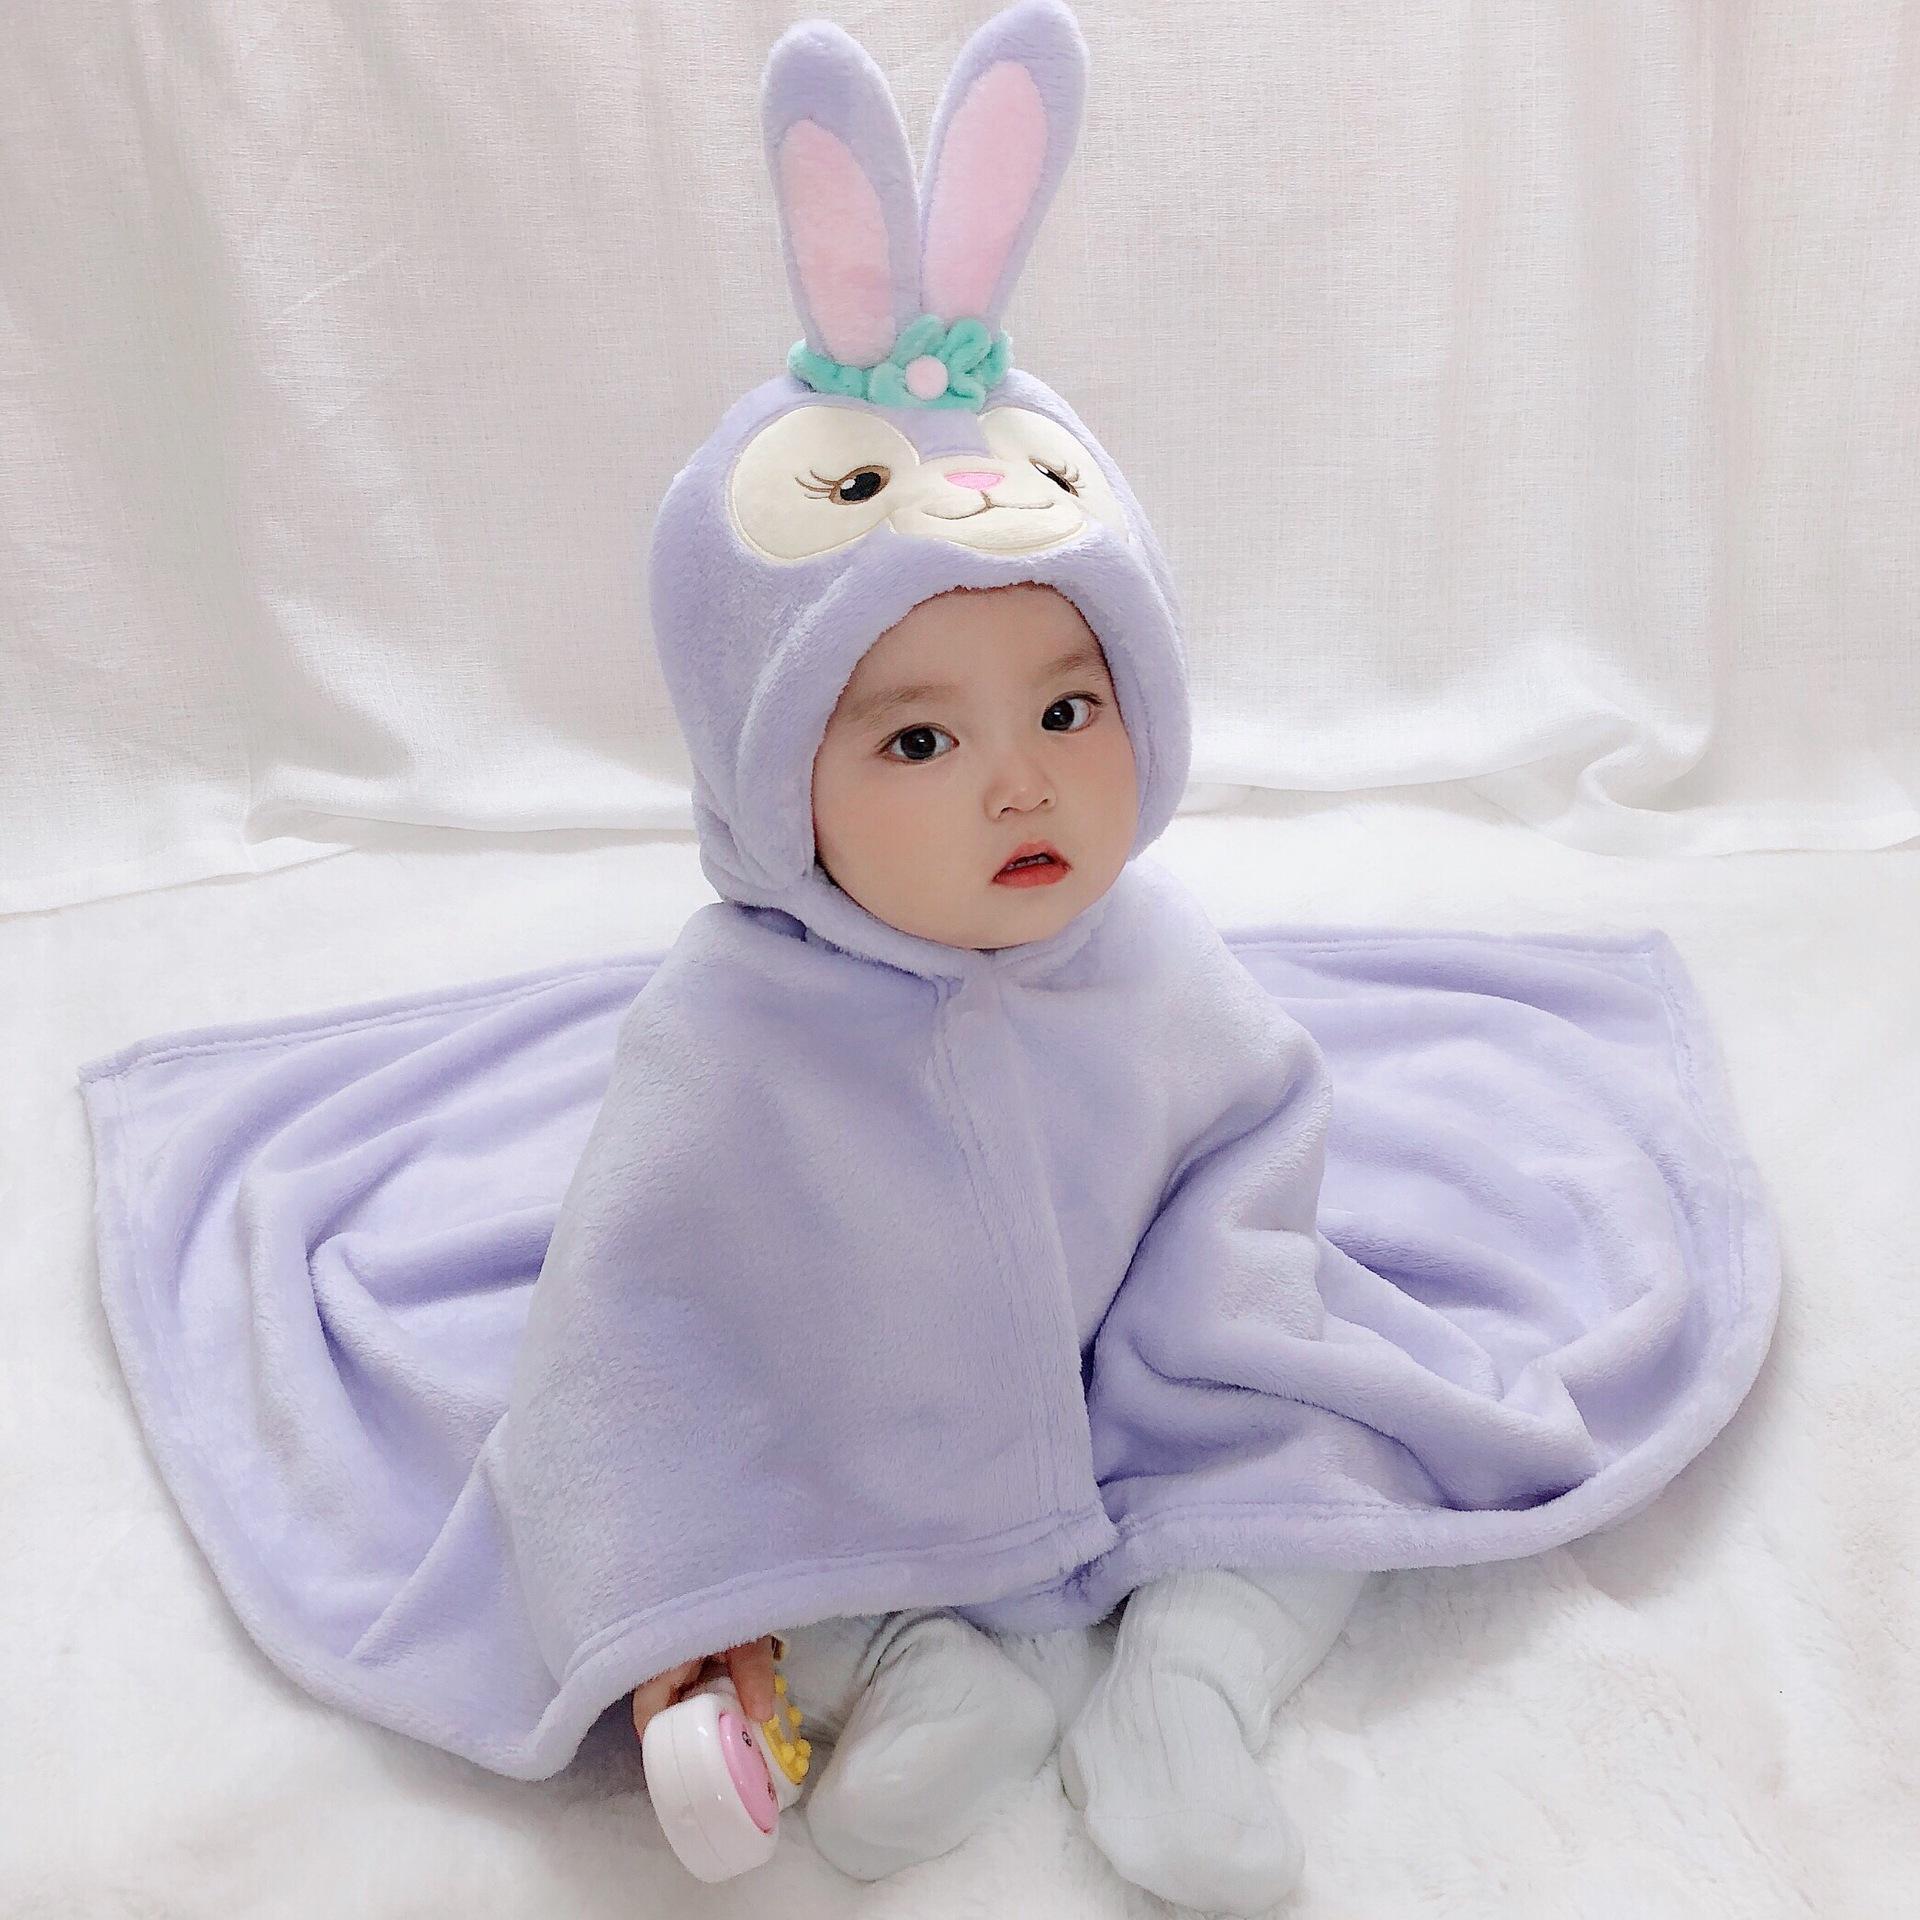 Kid Purple Rabbit Face Hooded Bathrobe Cape Bathrobe Cloak